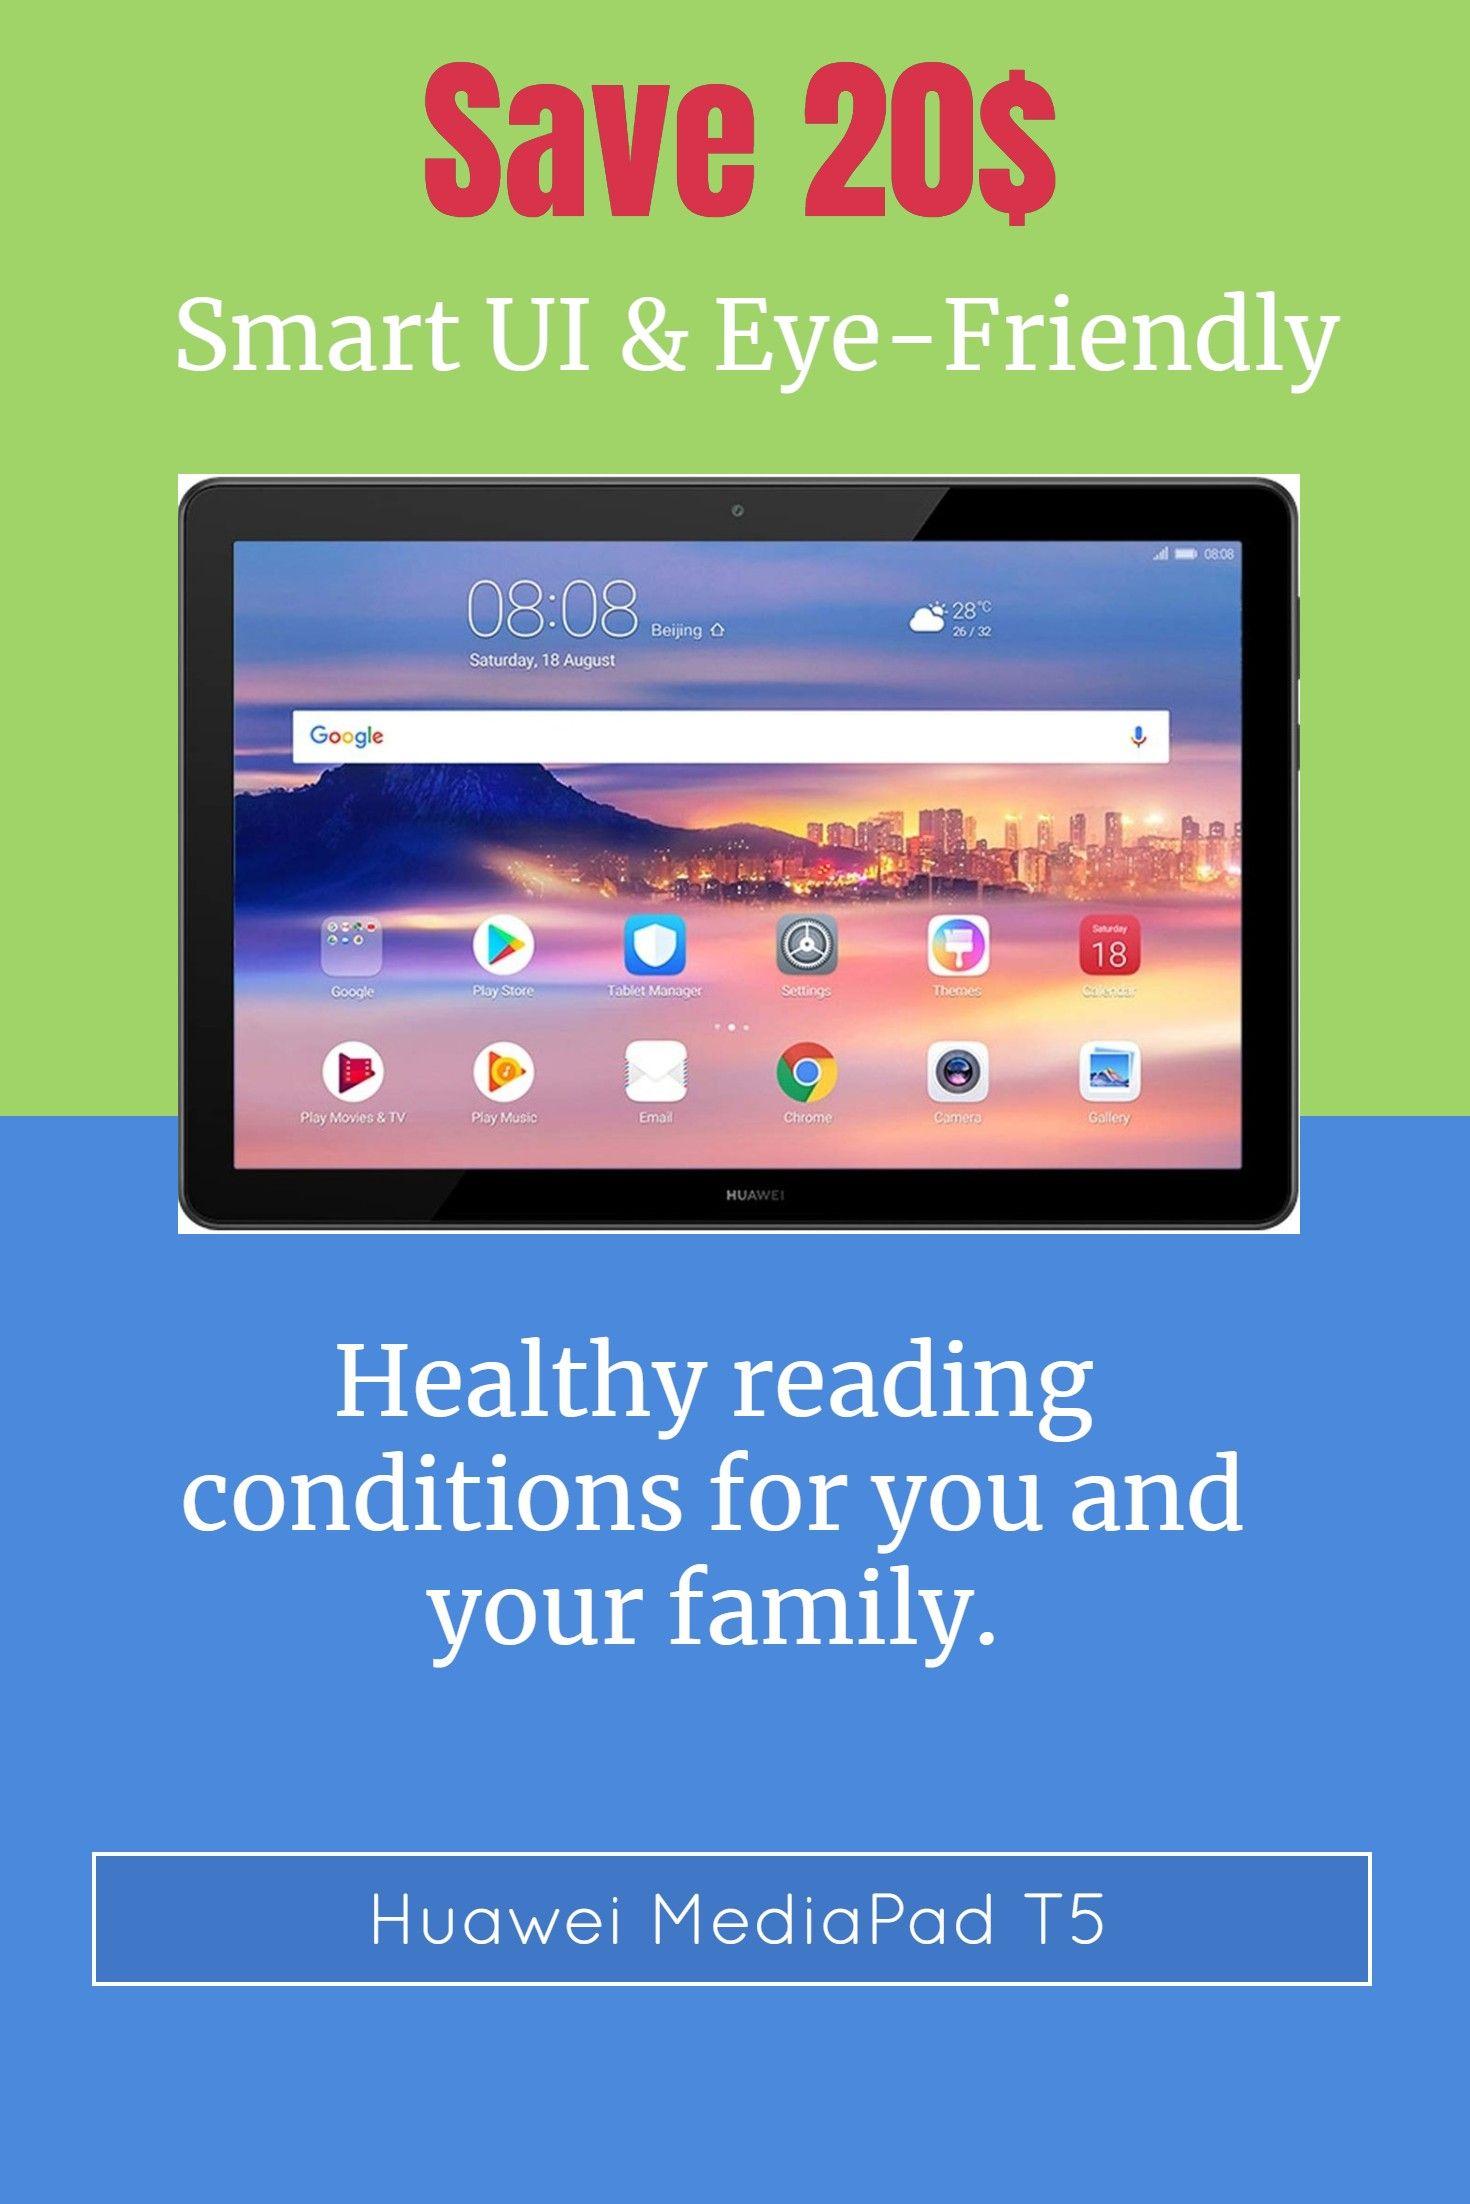 Huawei Android Tablet Mediapad T5 With 10 1 Ips Fhd Display Octa Core Dual Harman Kardon Tuned Speakers Wifi Only 2gb 16gb Huawei Android Tablets Tablet